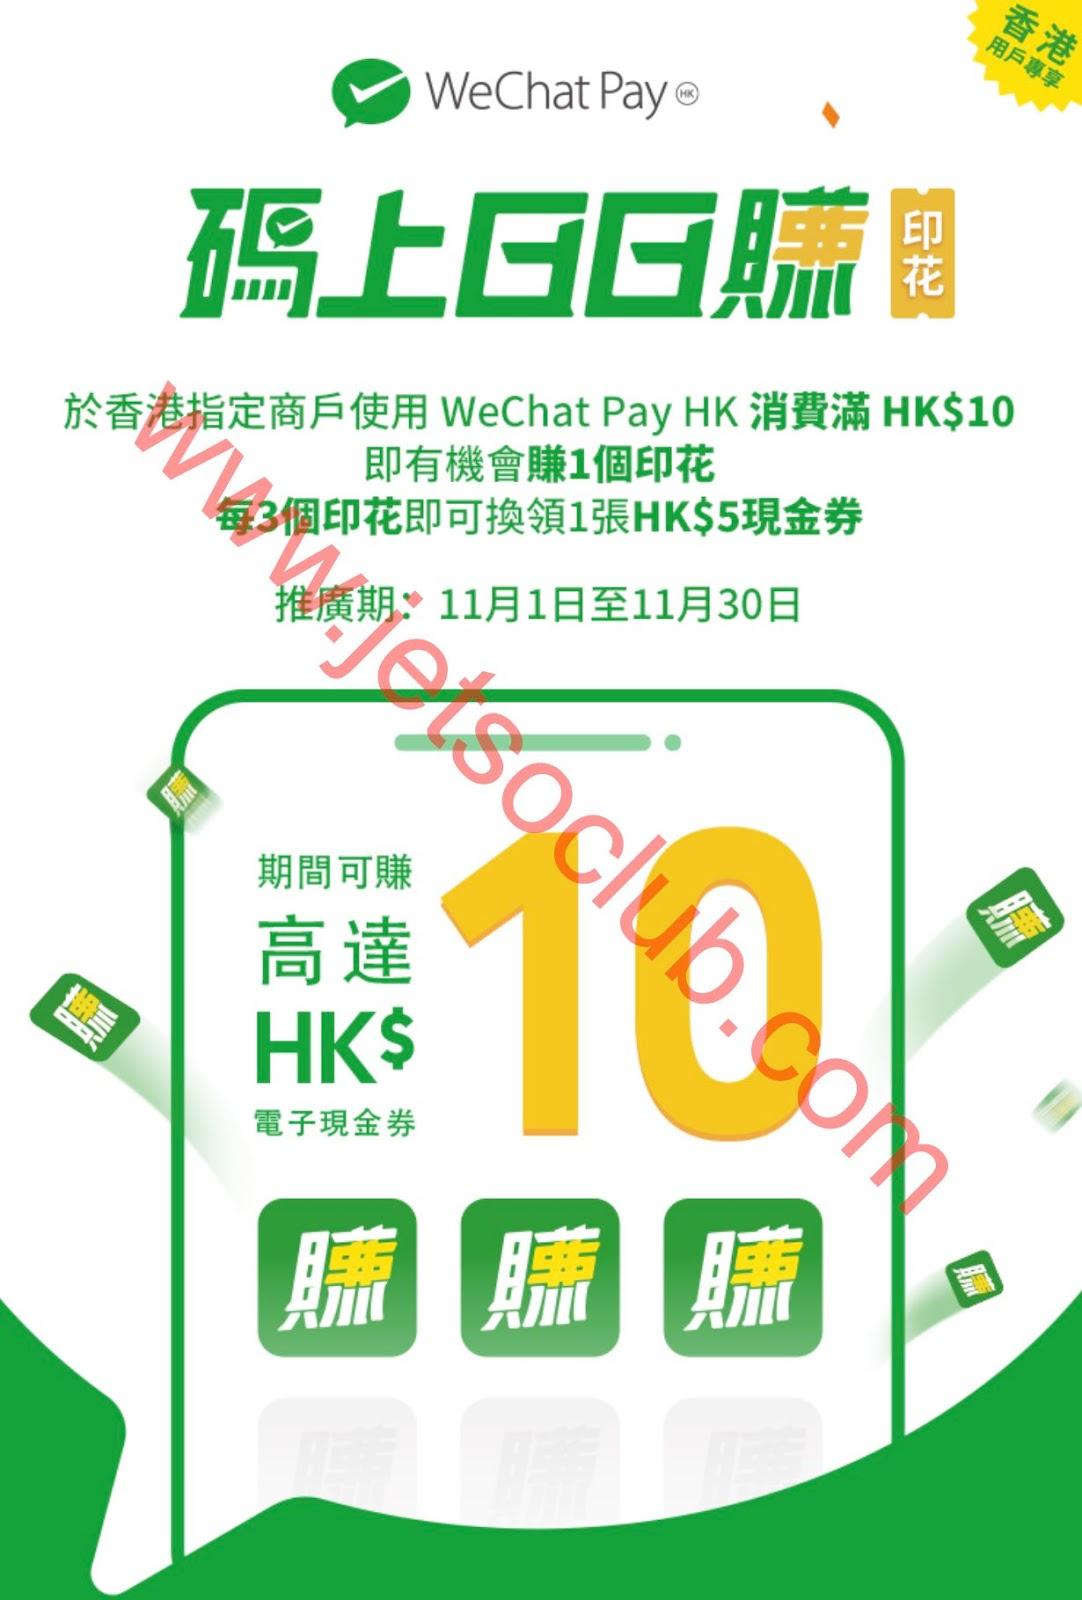 WeChat Pay HK:碼上日日賺印花 高達$10電子現金券(至30/11) ( Jetso Club 著數俱樂部 )